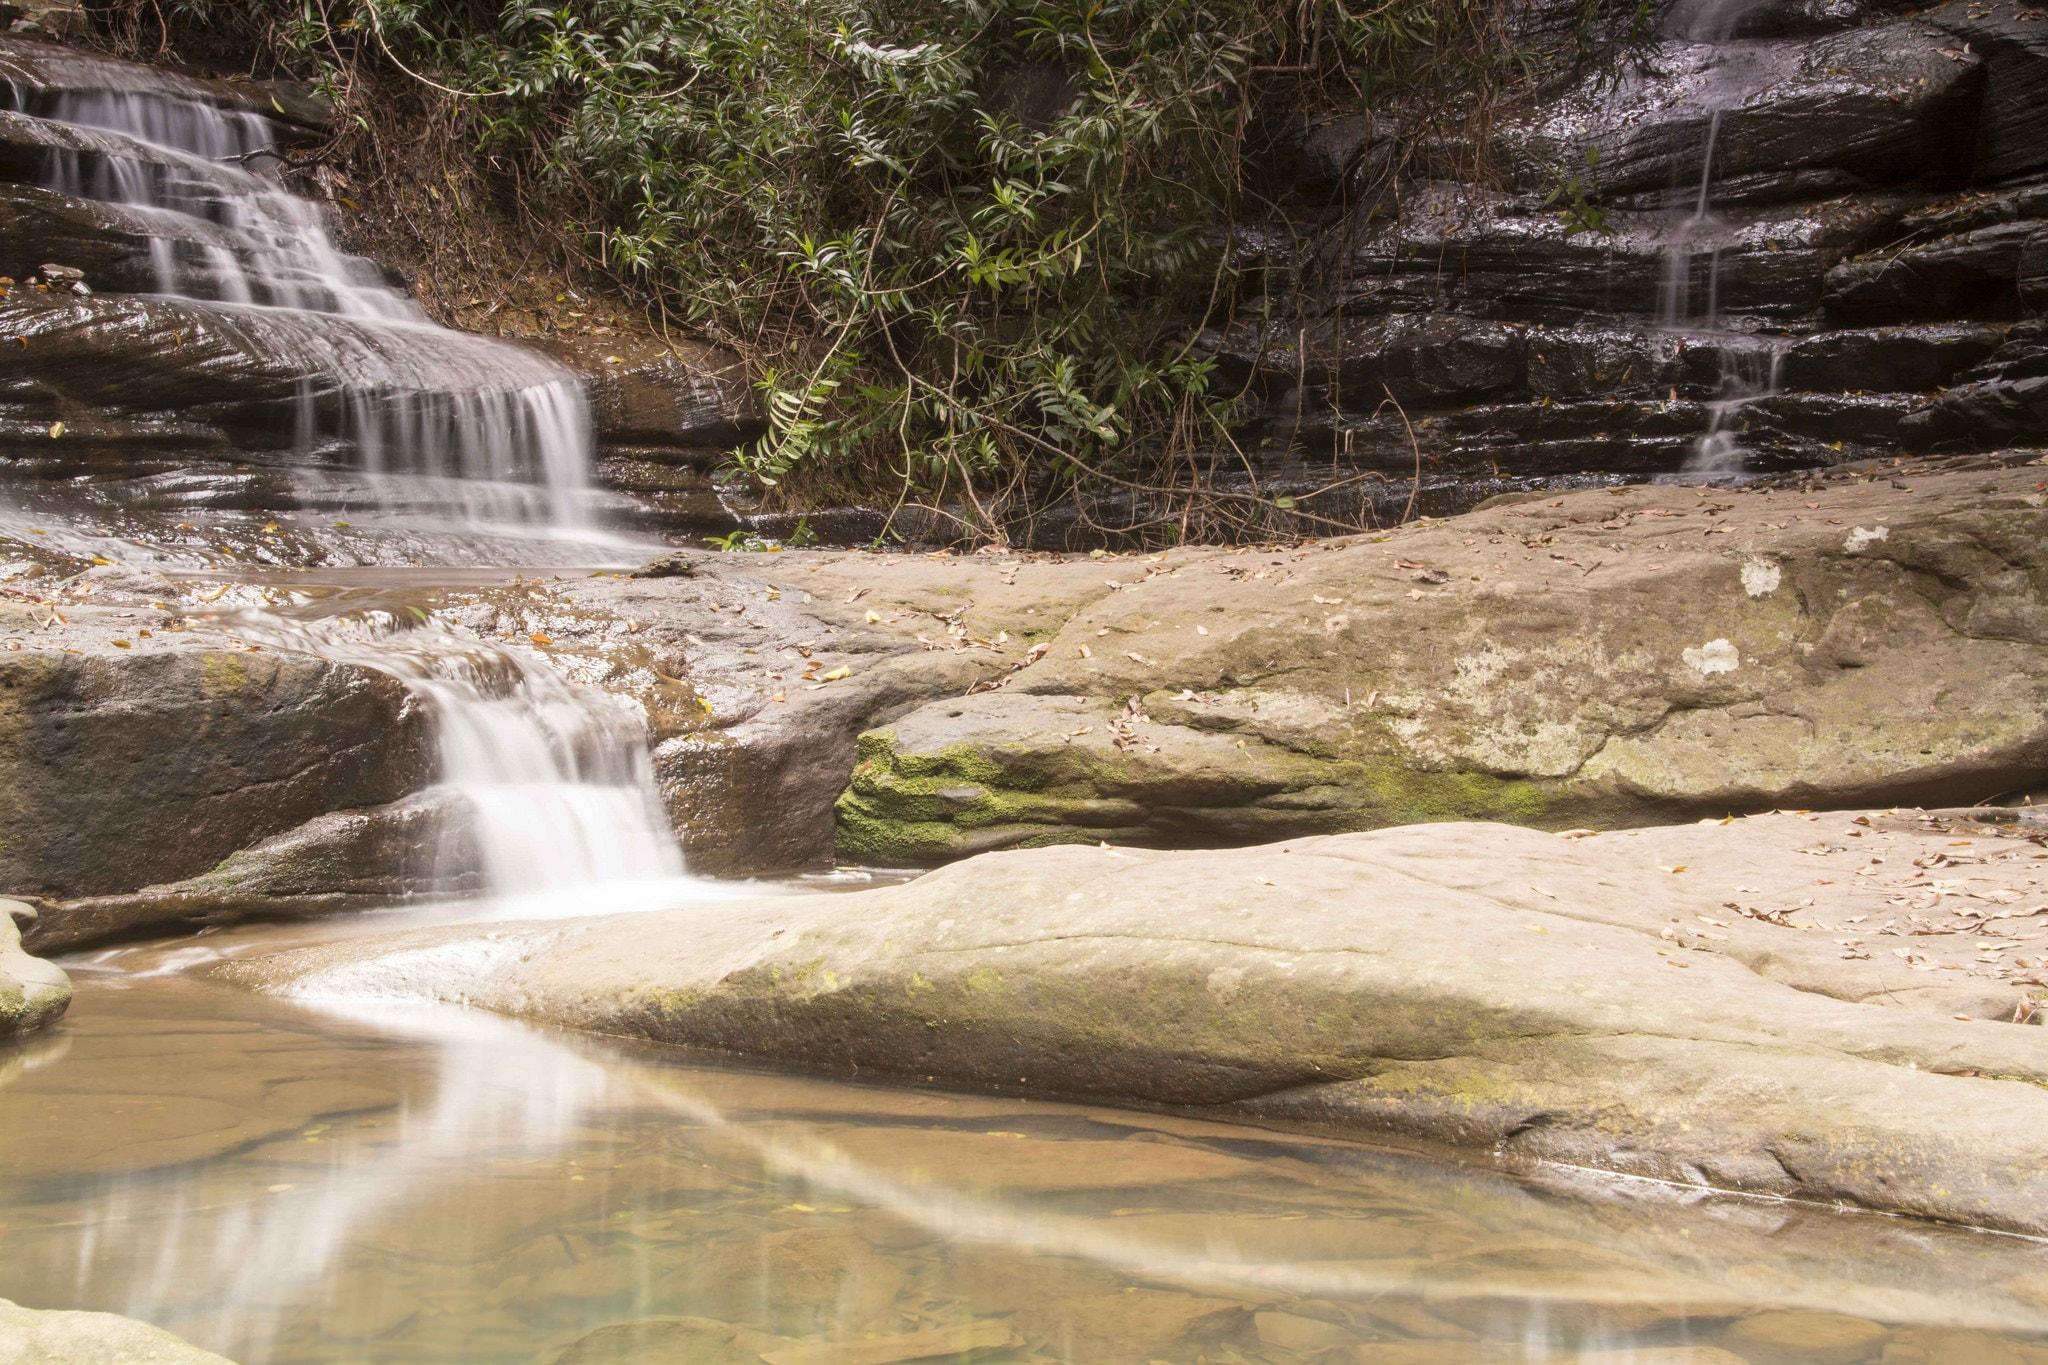 Buderim Falls © Flickr / David Minty